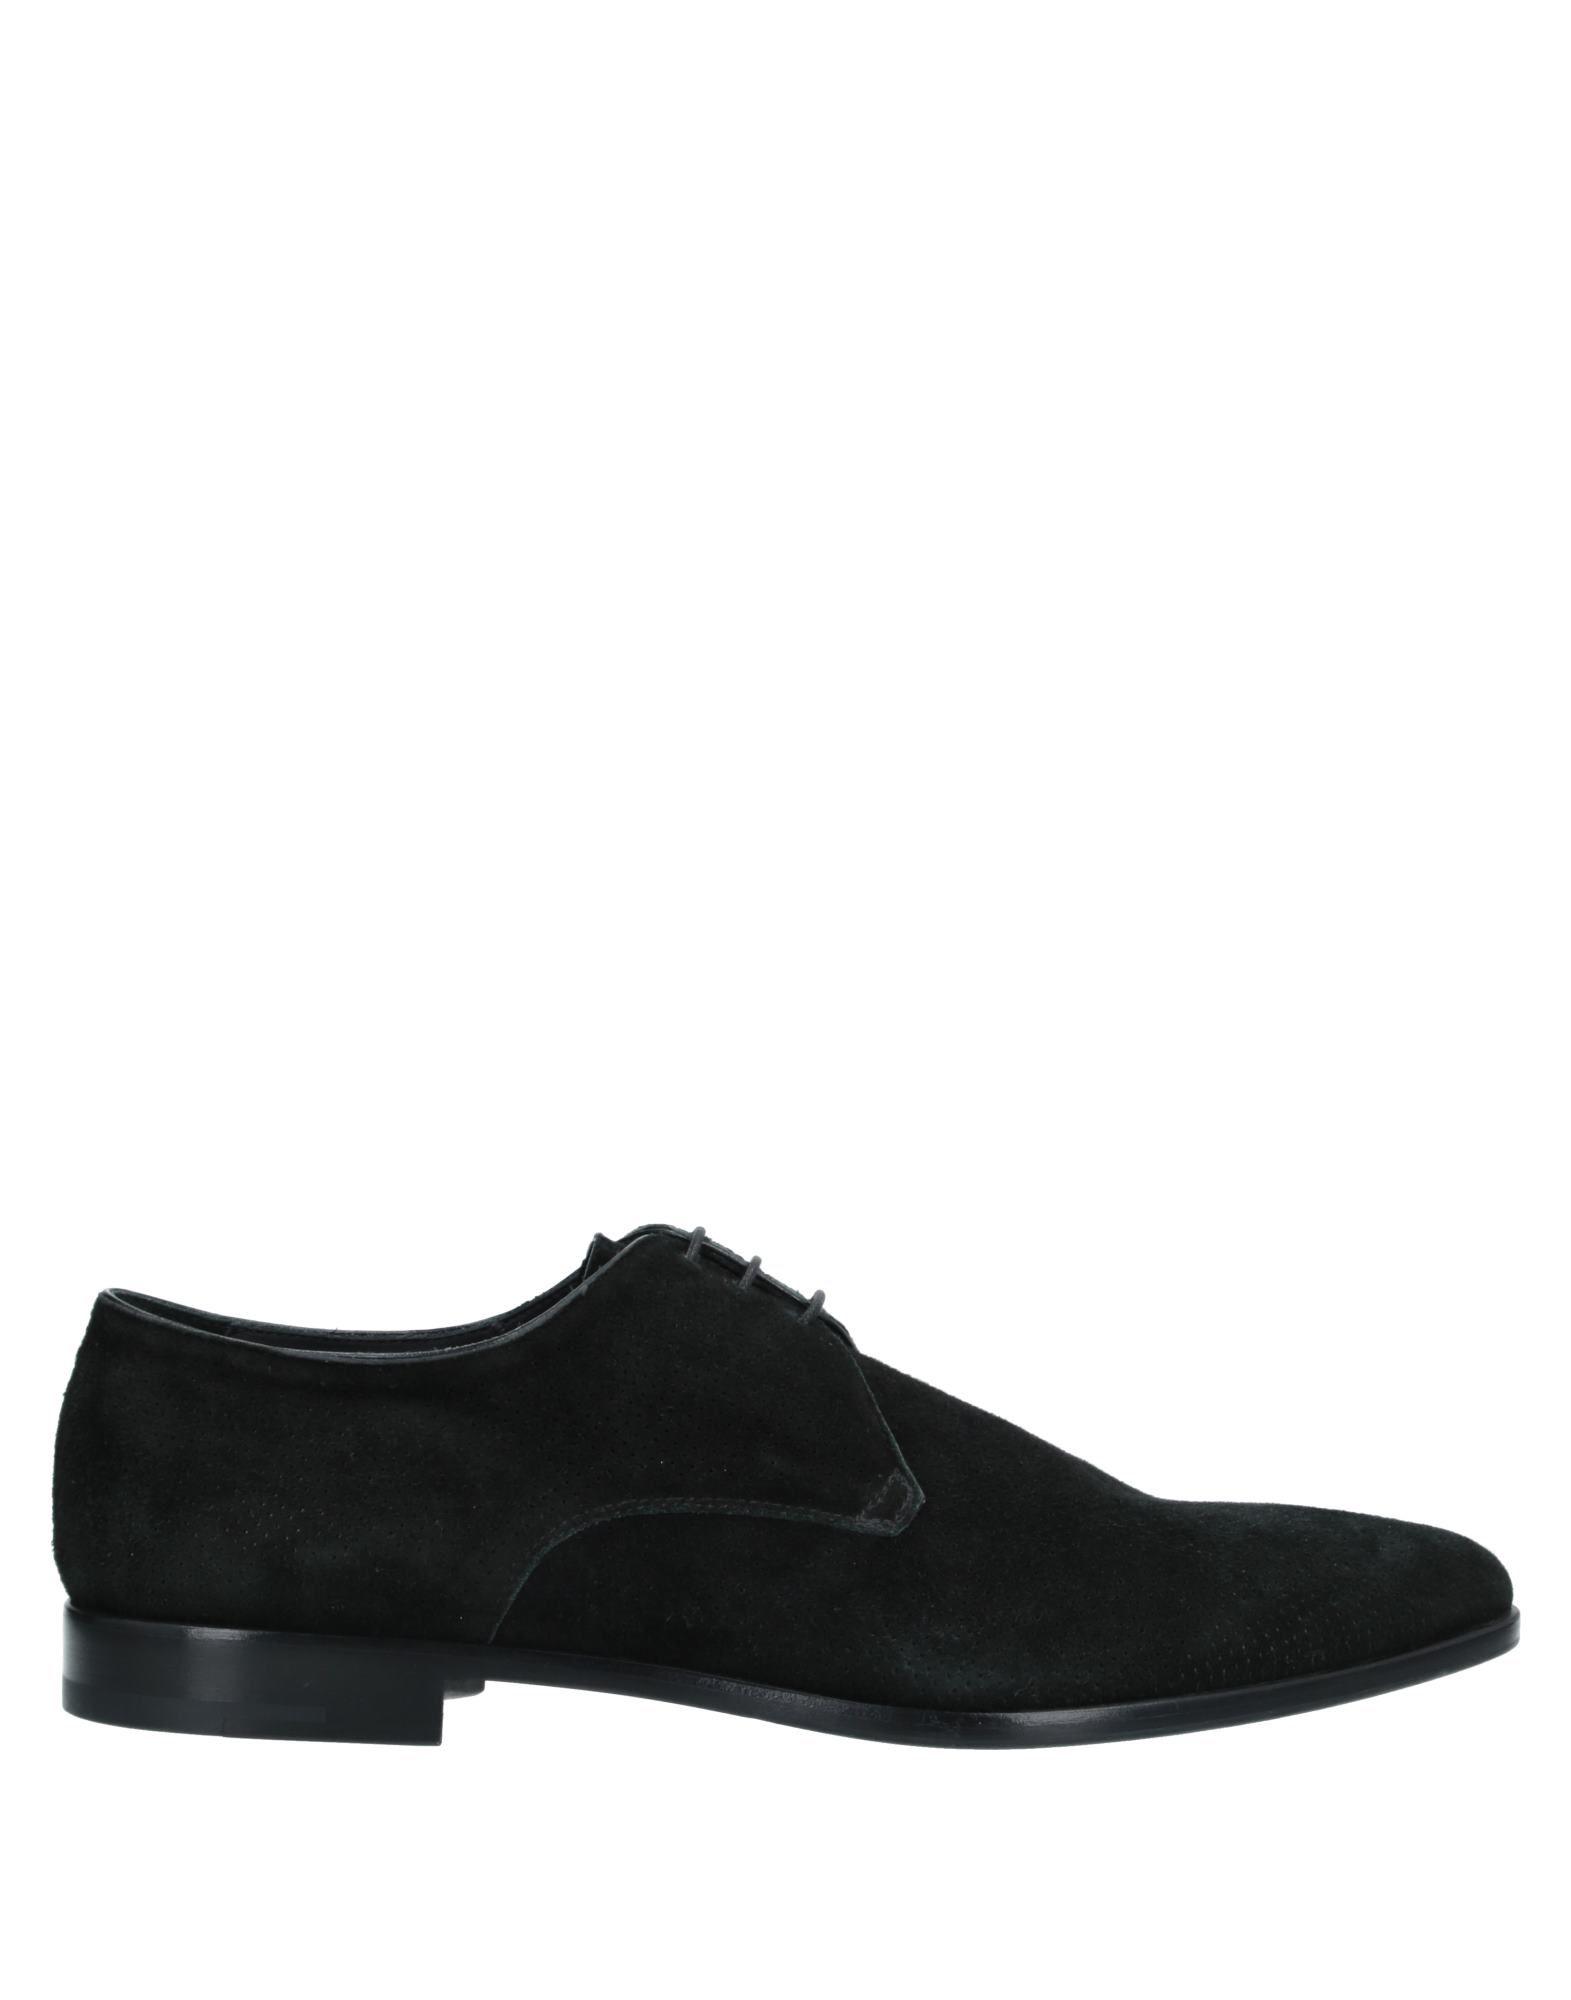 Фото - GIORGIO ARMANI Обувь на шнурках giorgio armani обувь на шнурках